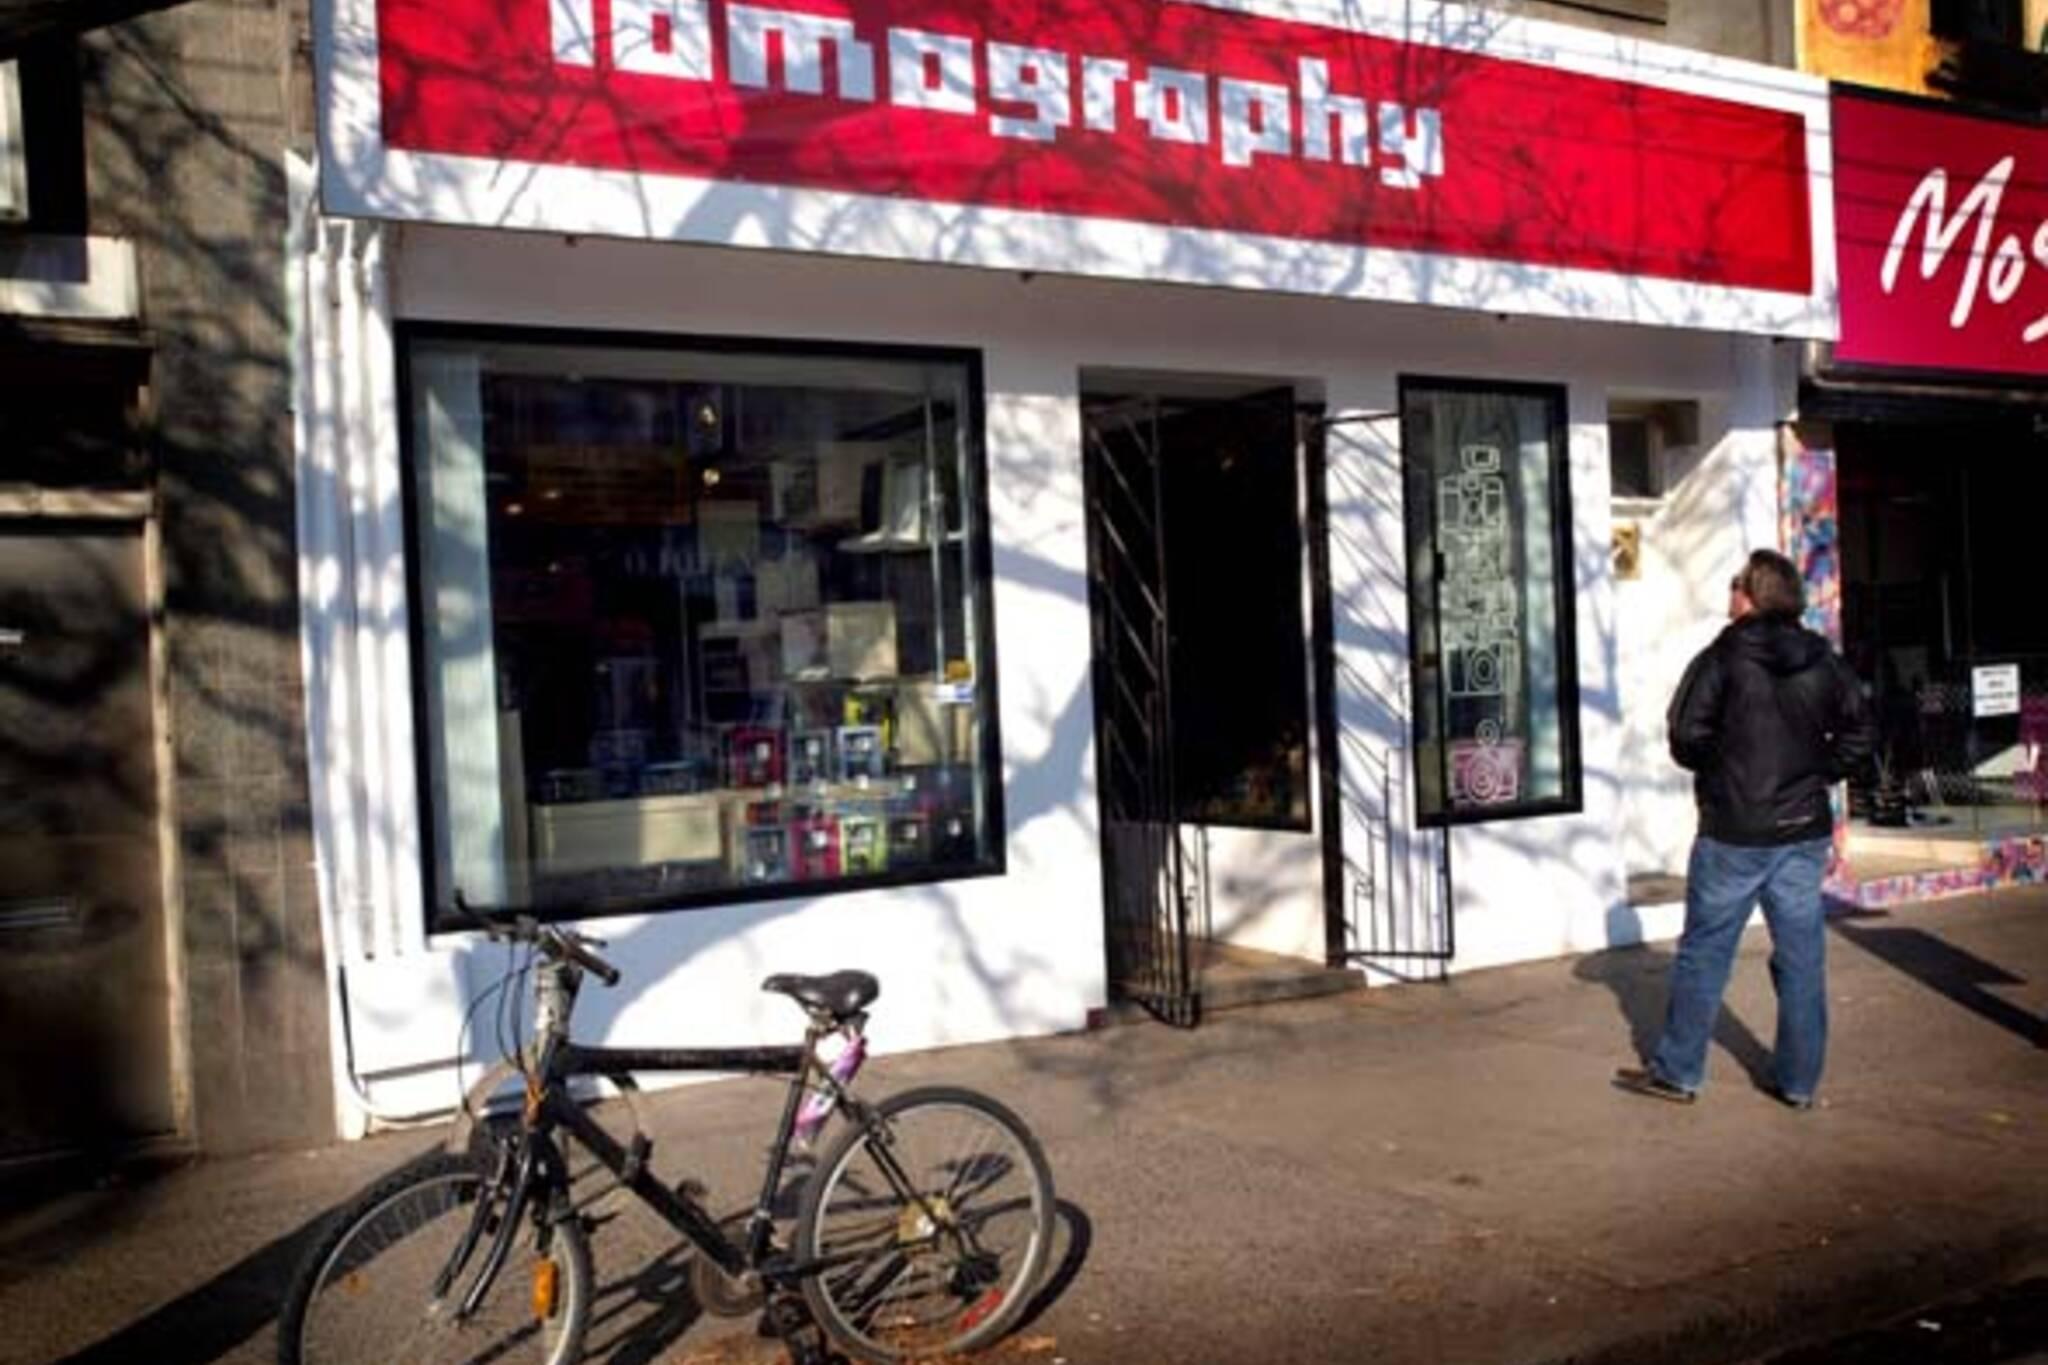 Lomography Store Toronto Closed